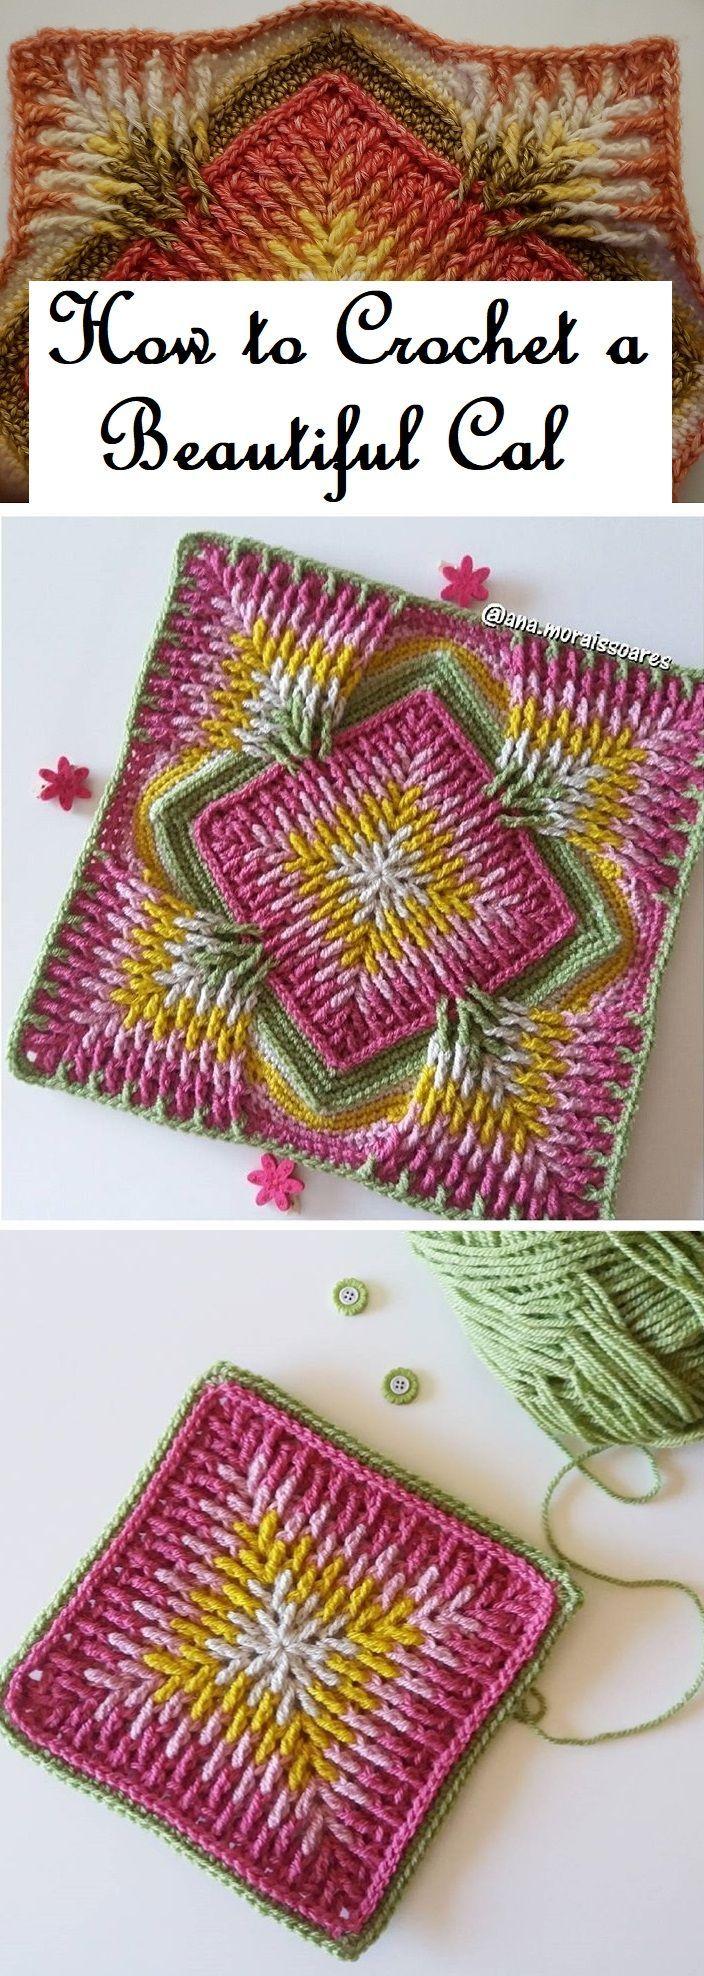 Crochet Cal Tutorial